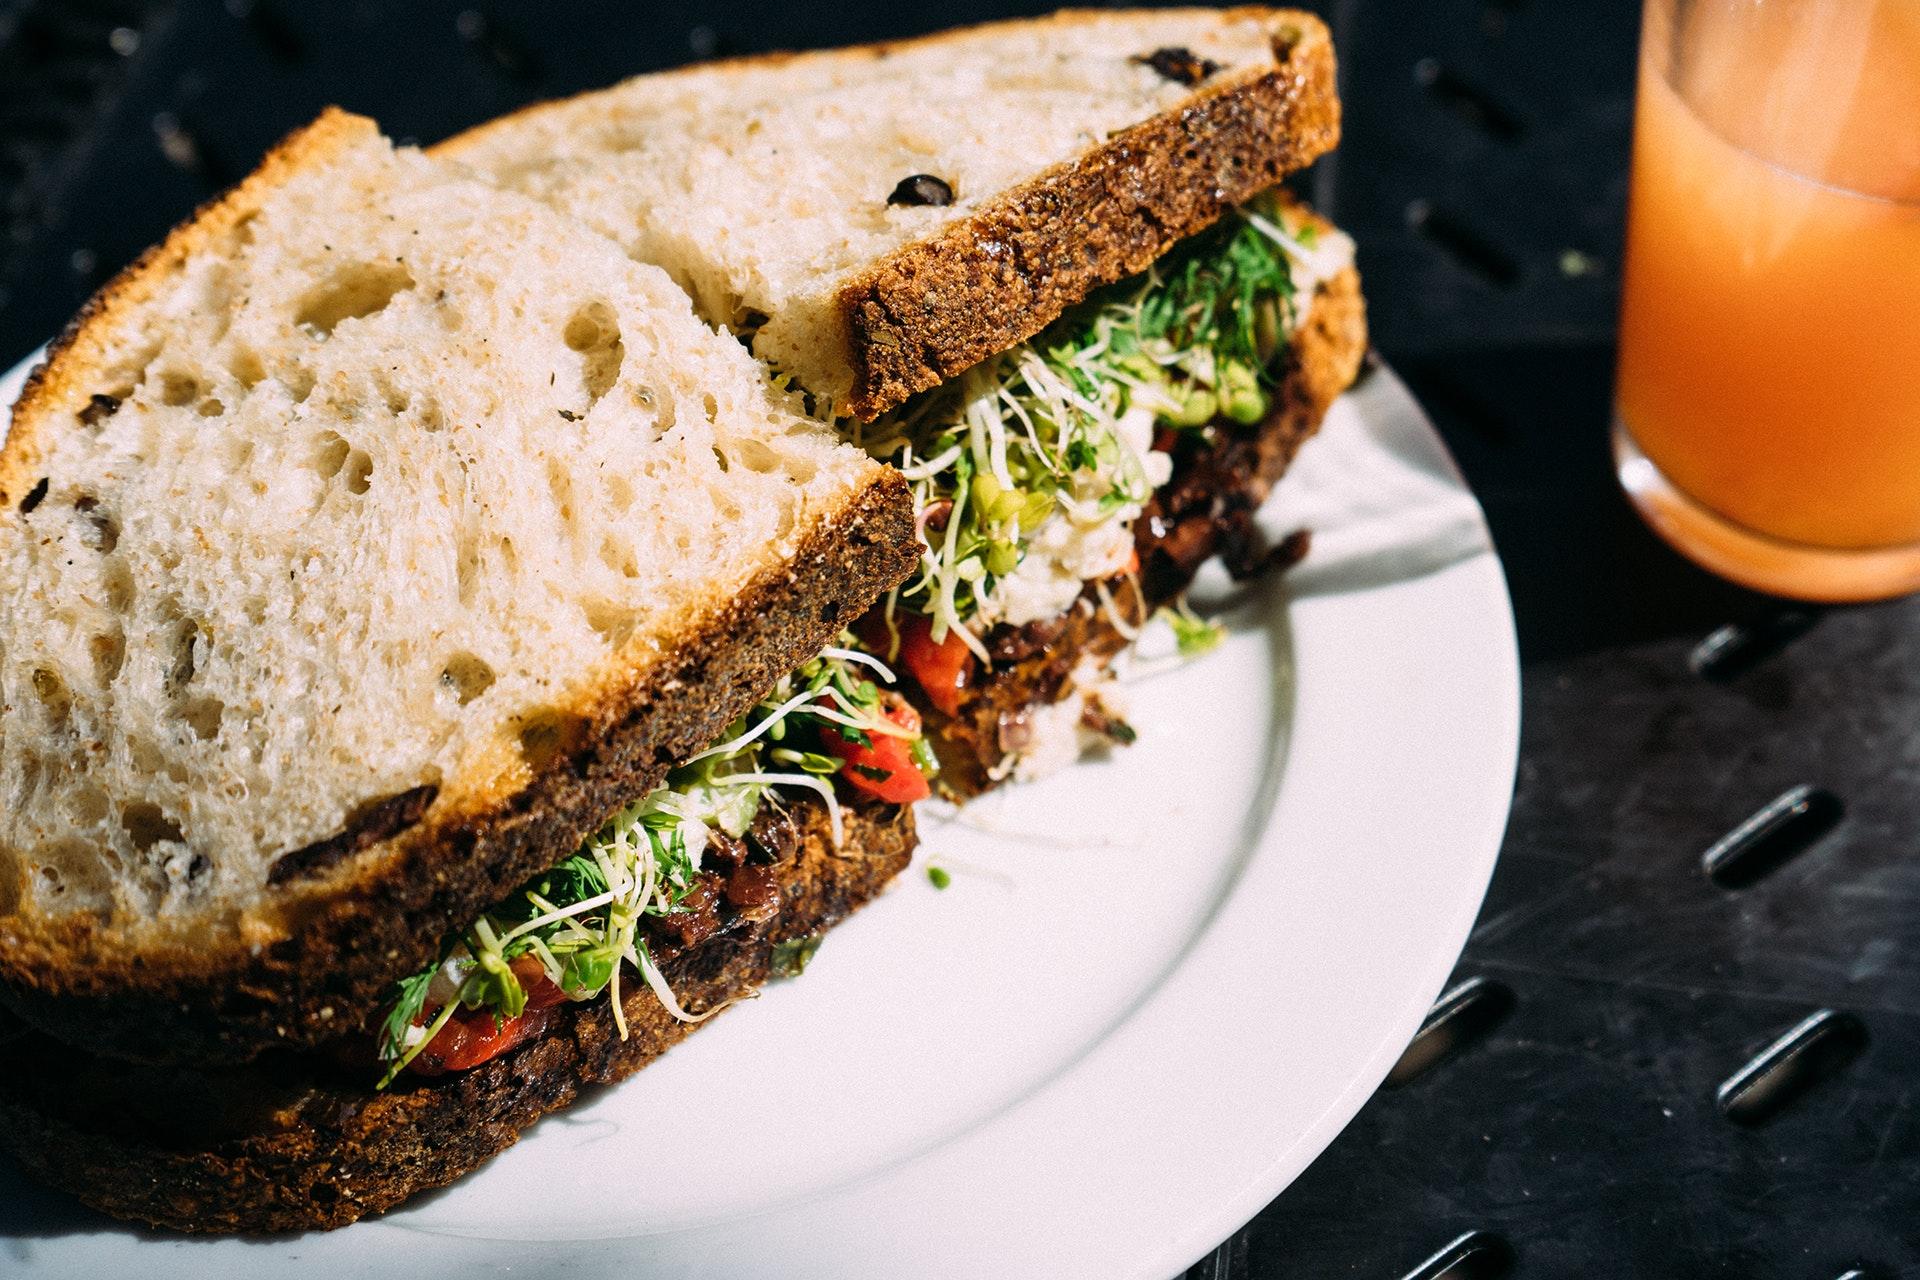 Sándwich saludable.jpg